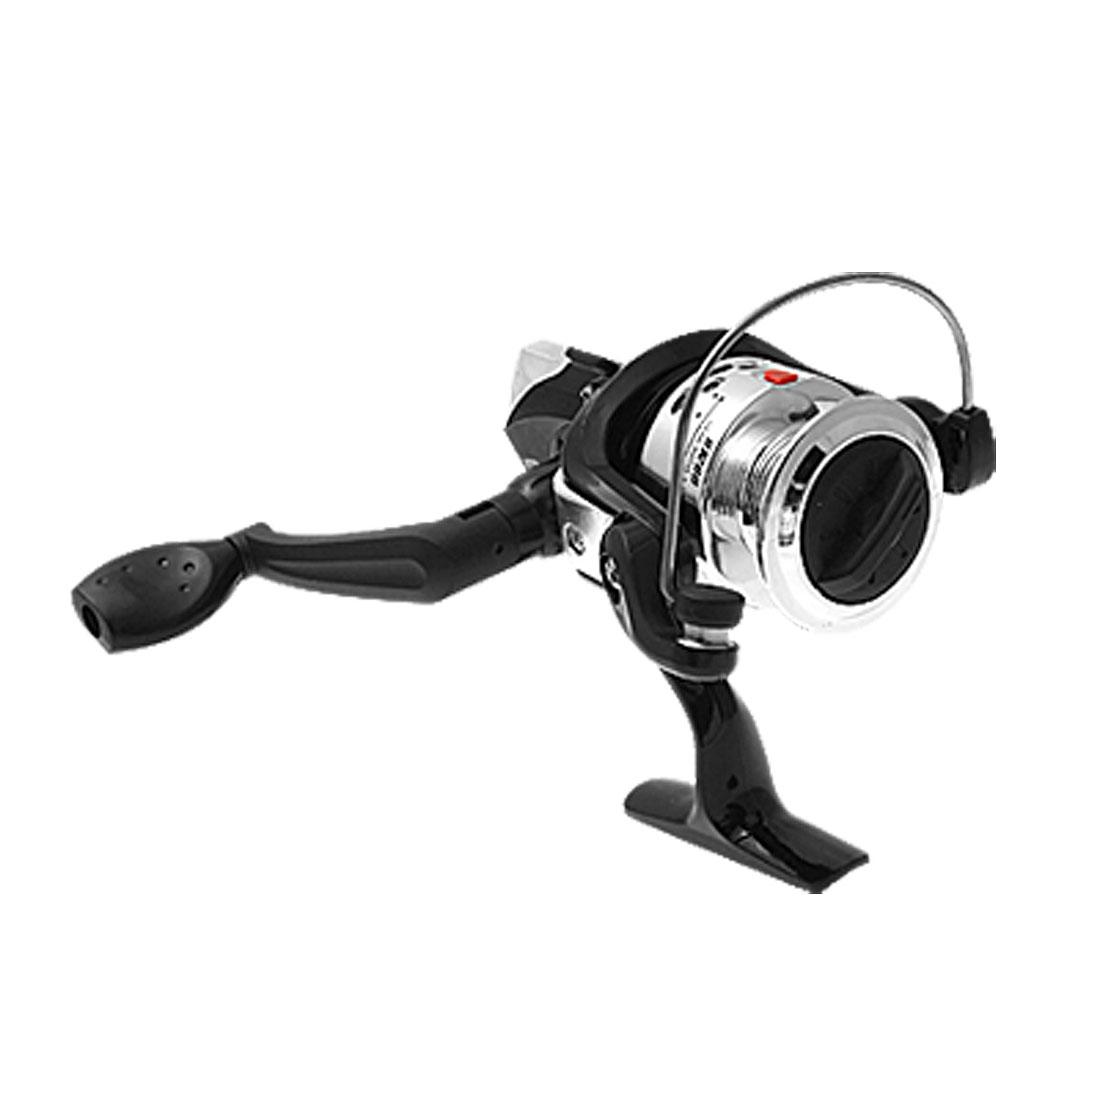 5.2:1 Ratio Black Fishing Spinning Reel Gear Line Roller Spool